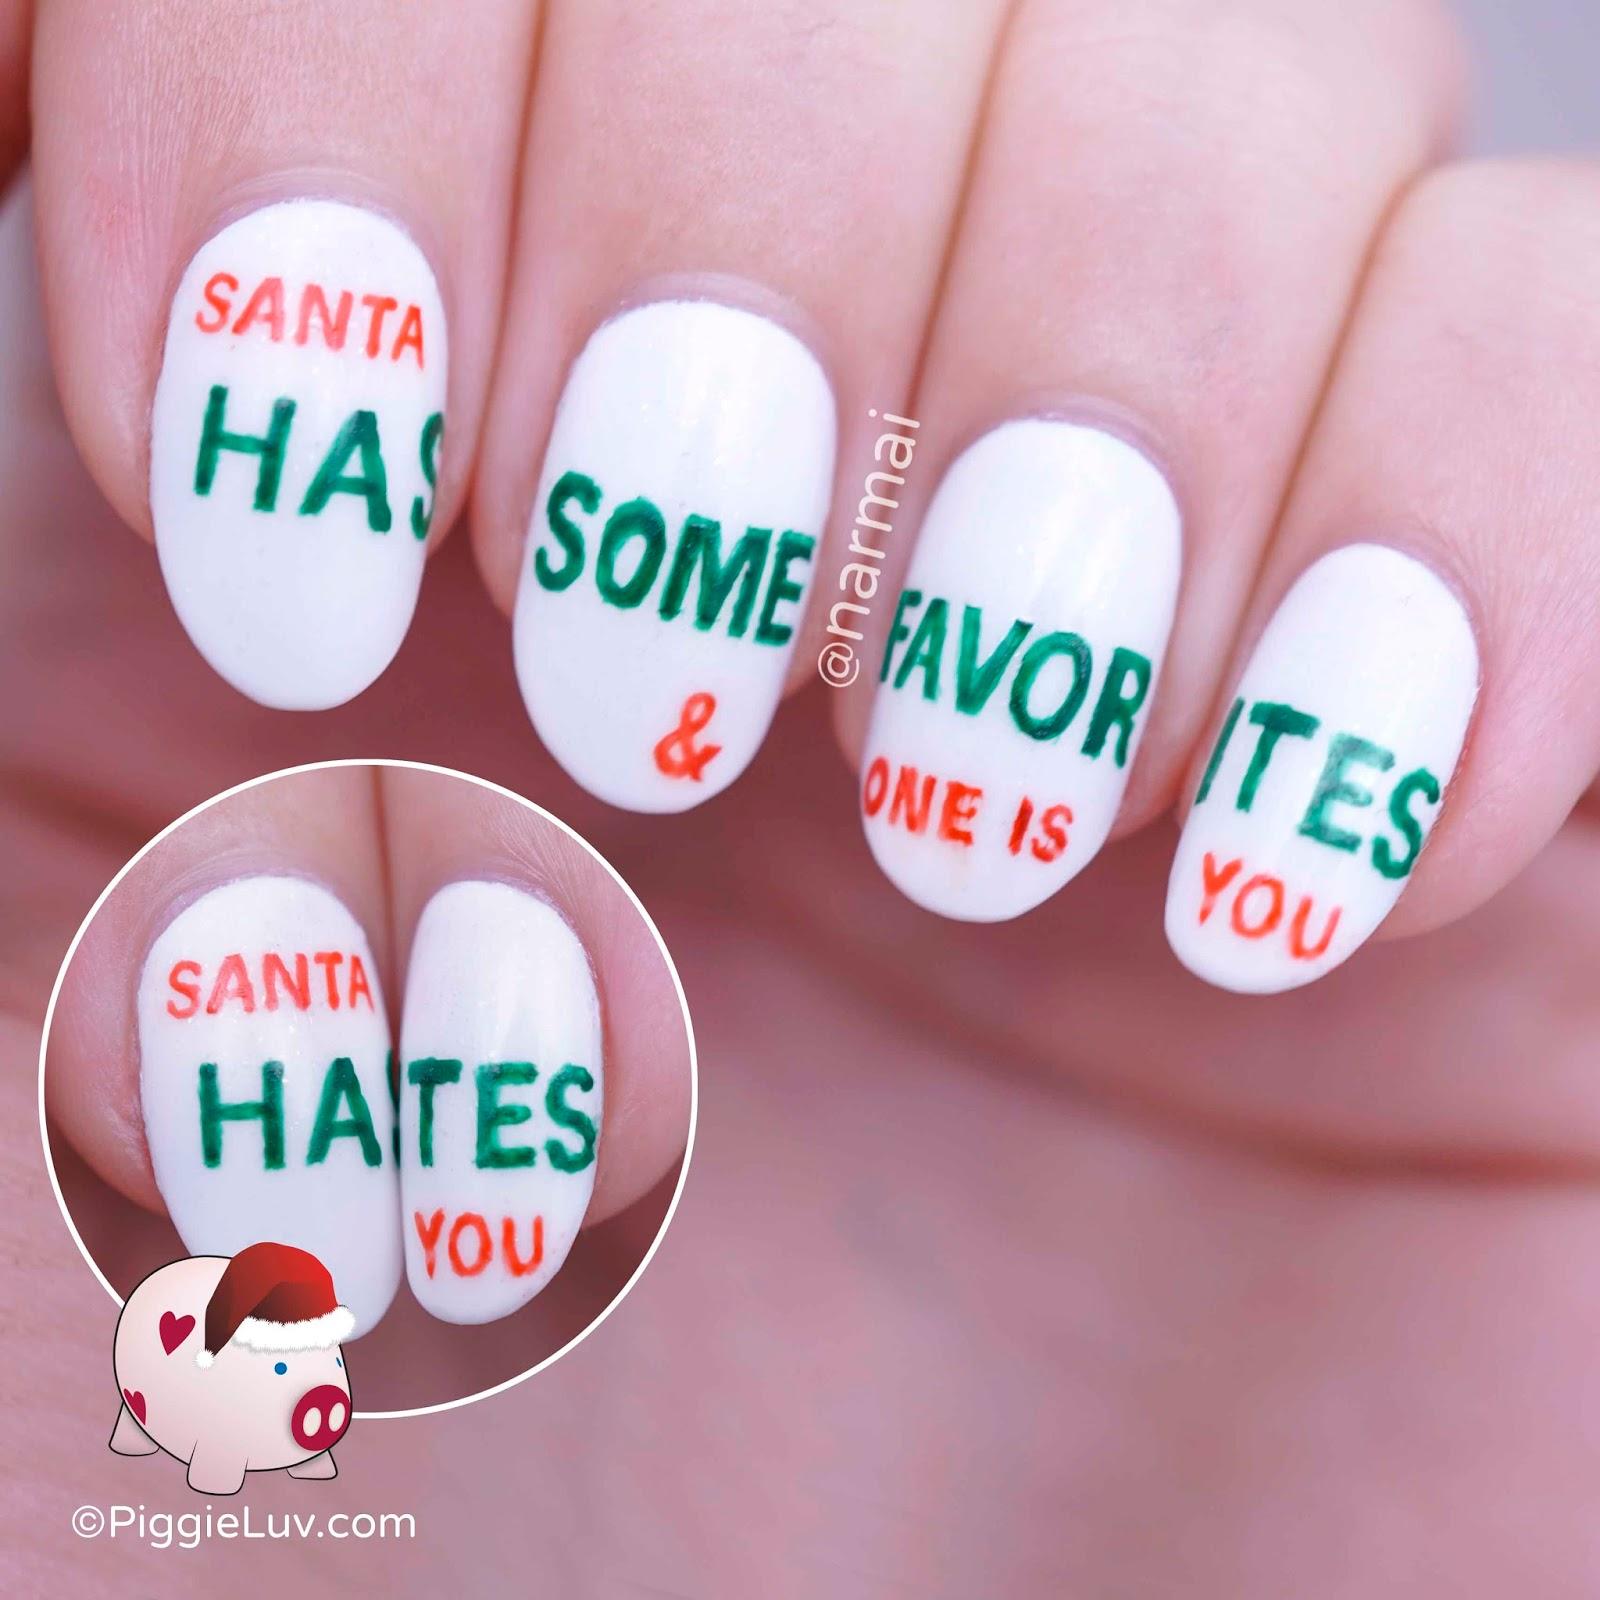 Secret Christmas message